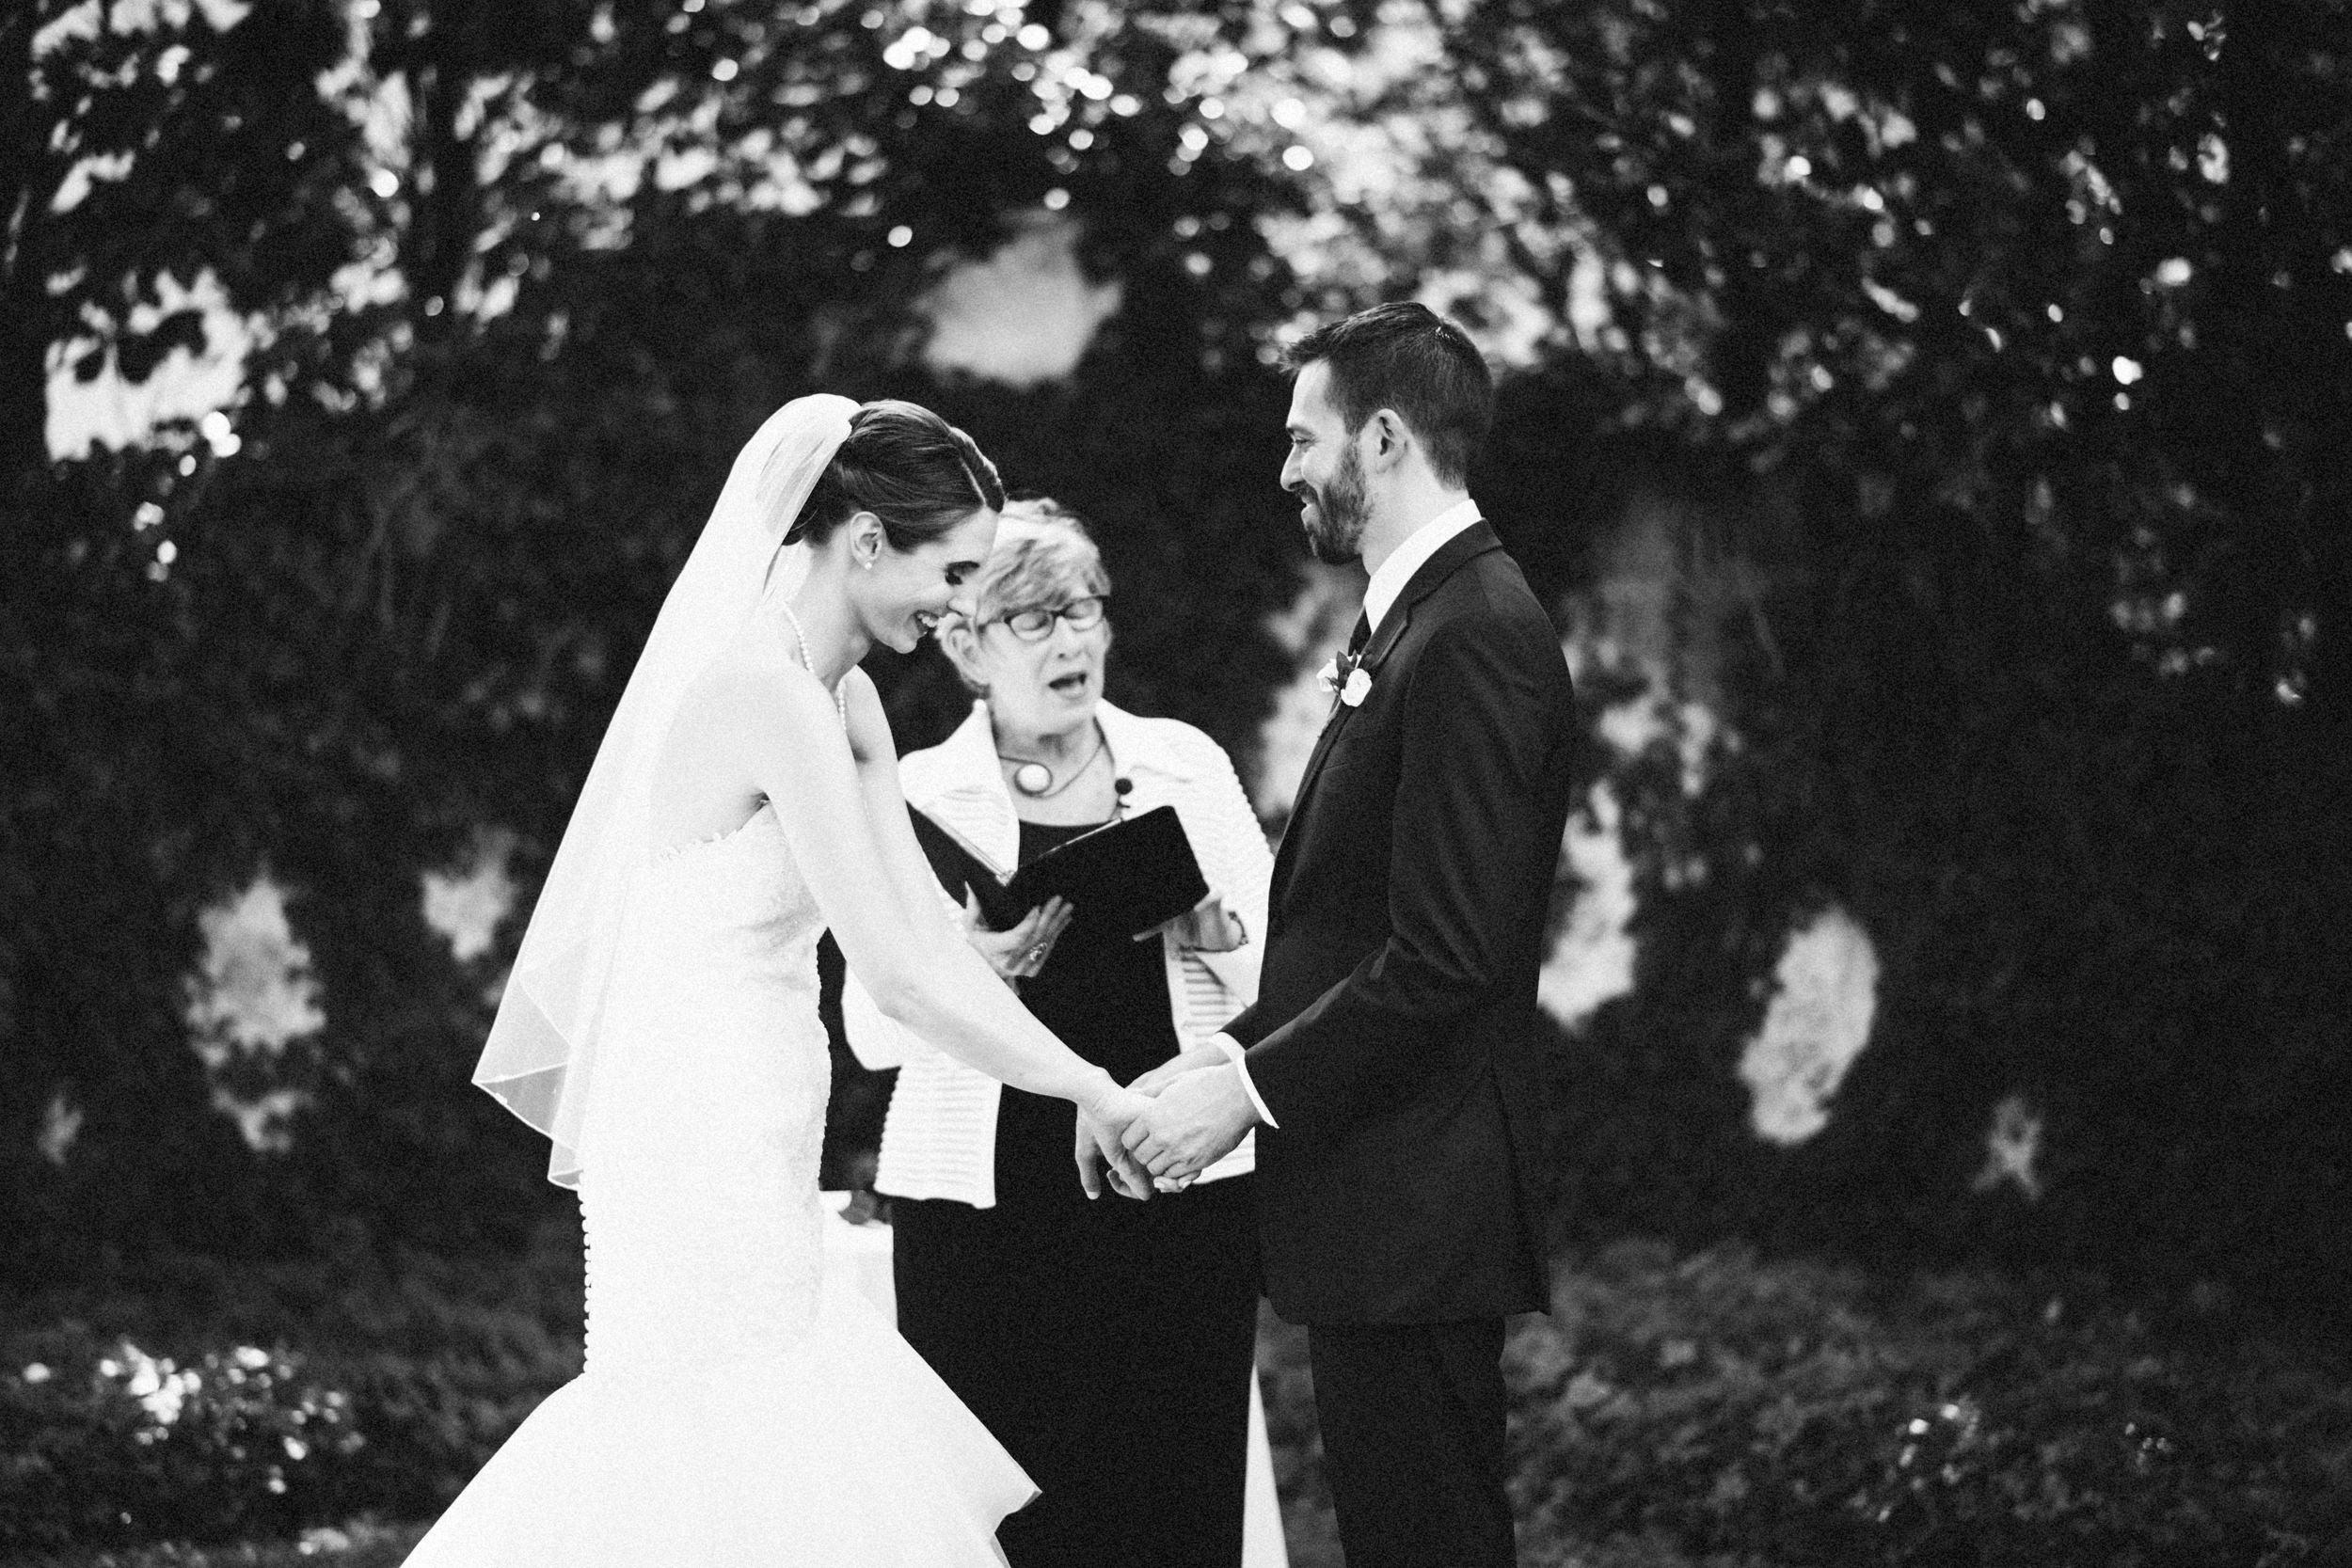 Louisville-Kentucky-Wedding-Elopement-Photographer-Sarah-Katherine-Davis-Photography-Whitehall-Classic-Timeless-Garden-Wedding-387.jpg